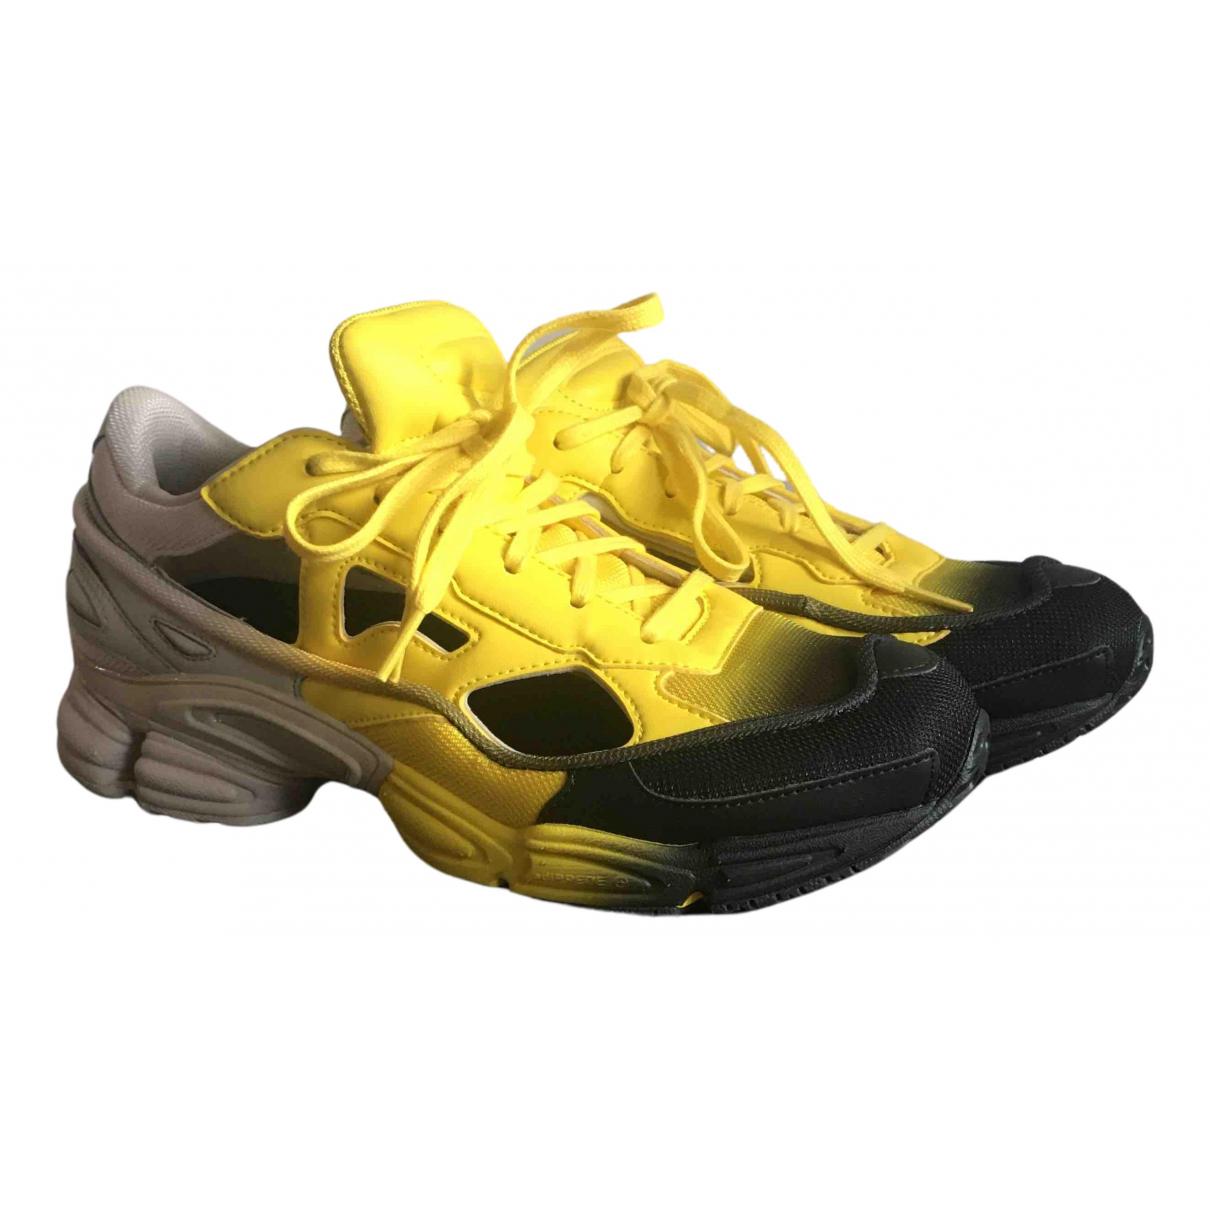 Adidas X Raf Simons Replicant Owzeego Yellow Trainers for Men 40.5 EU